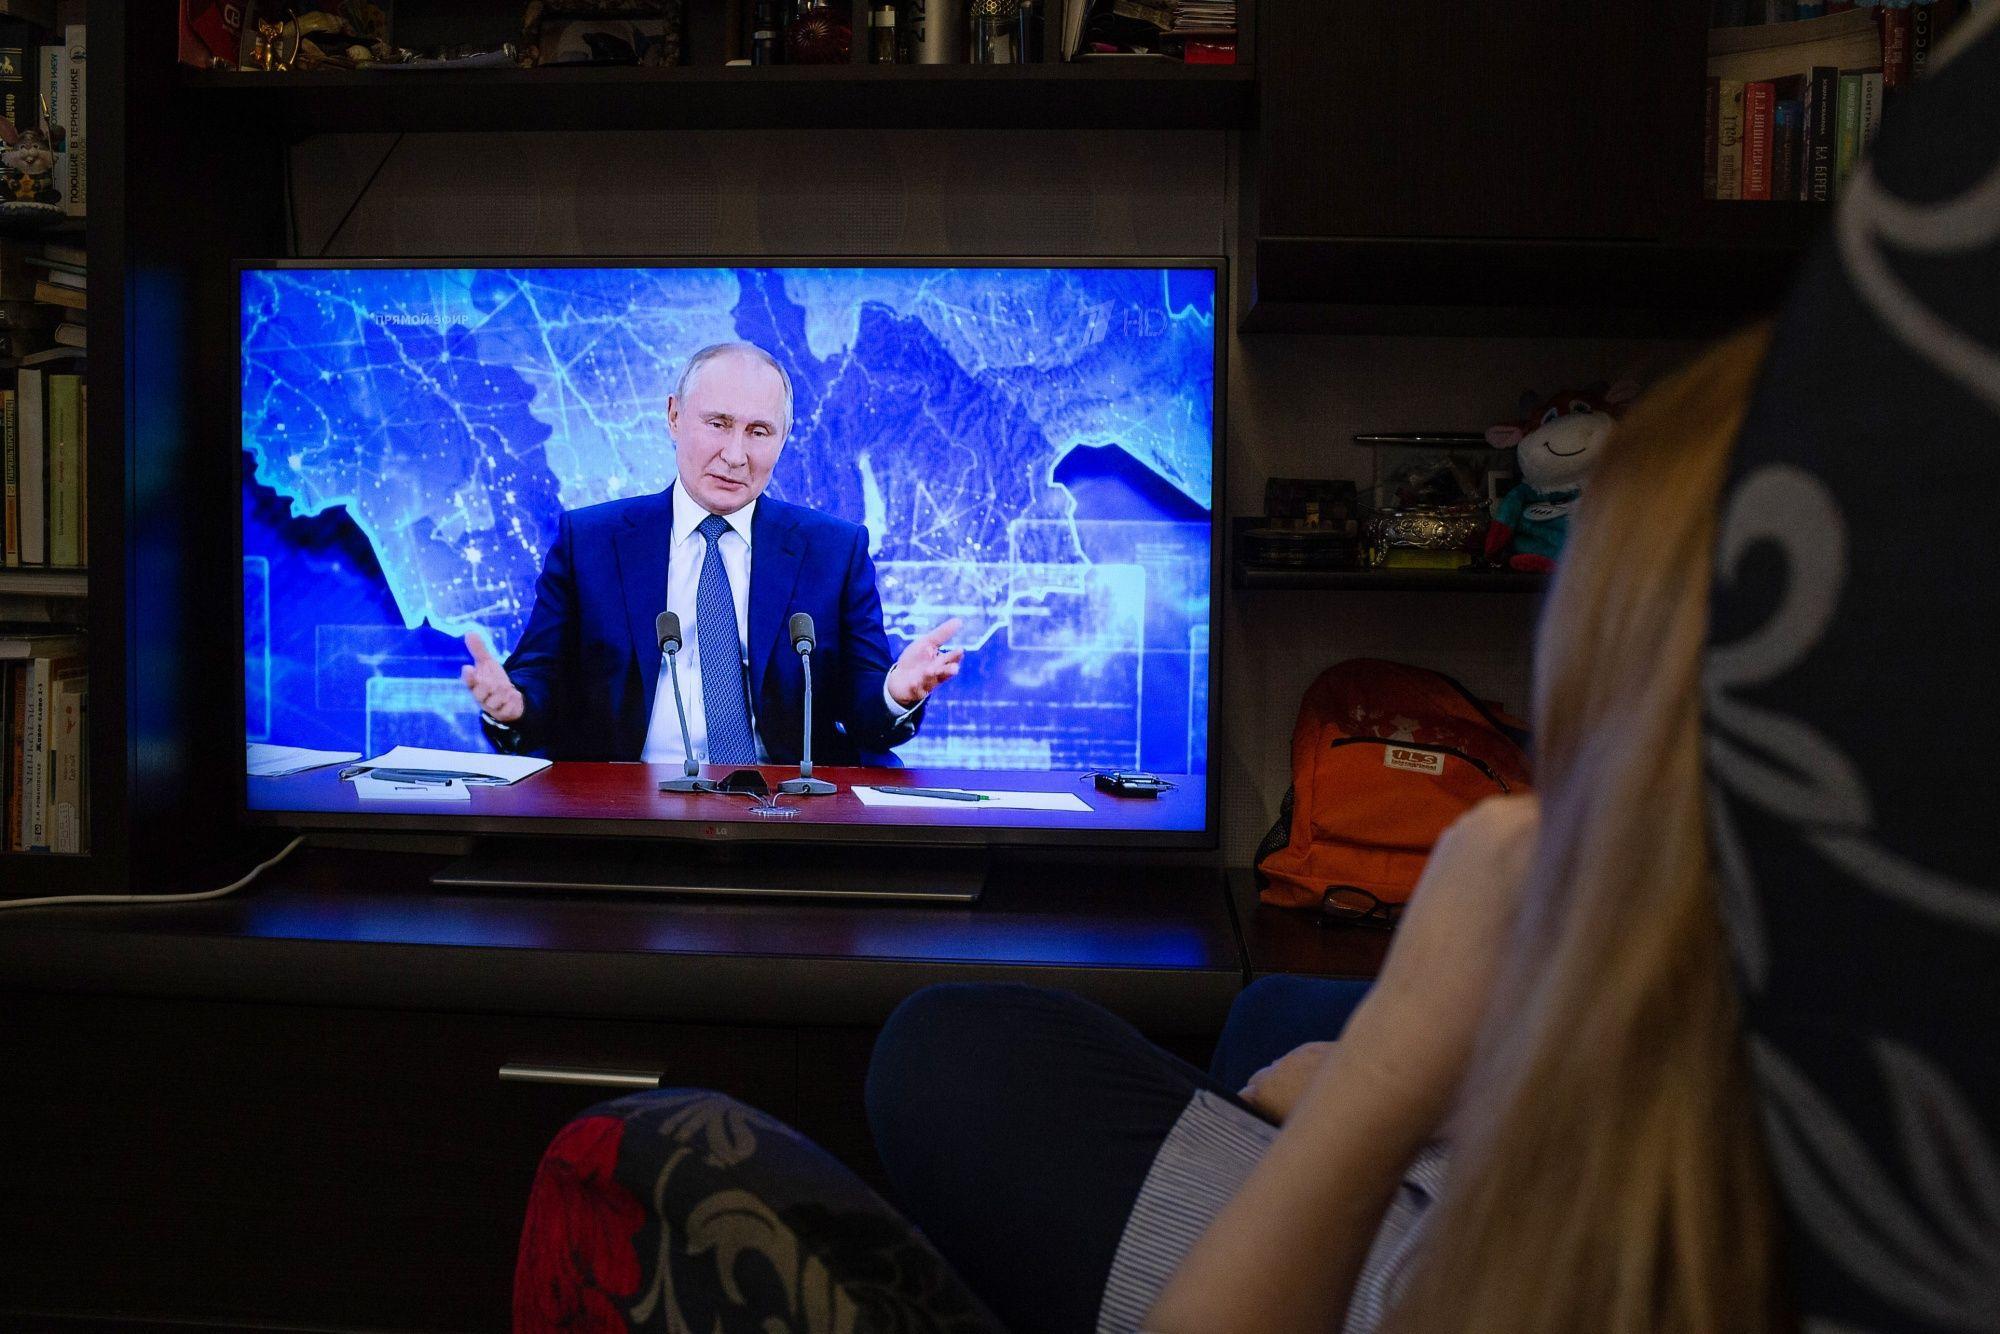 Vladimir Putin on Dec. 17. Photographer: Andrey Rudakov/Bloomberg